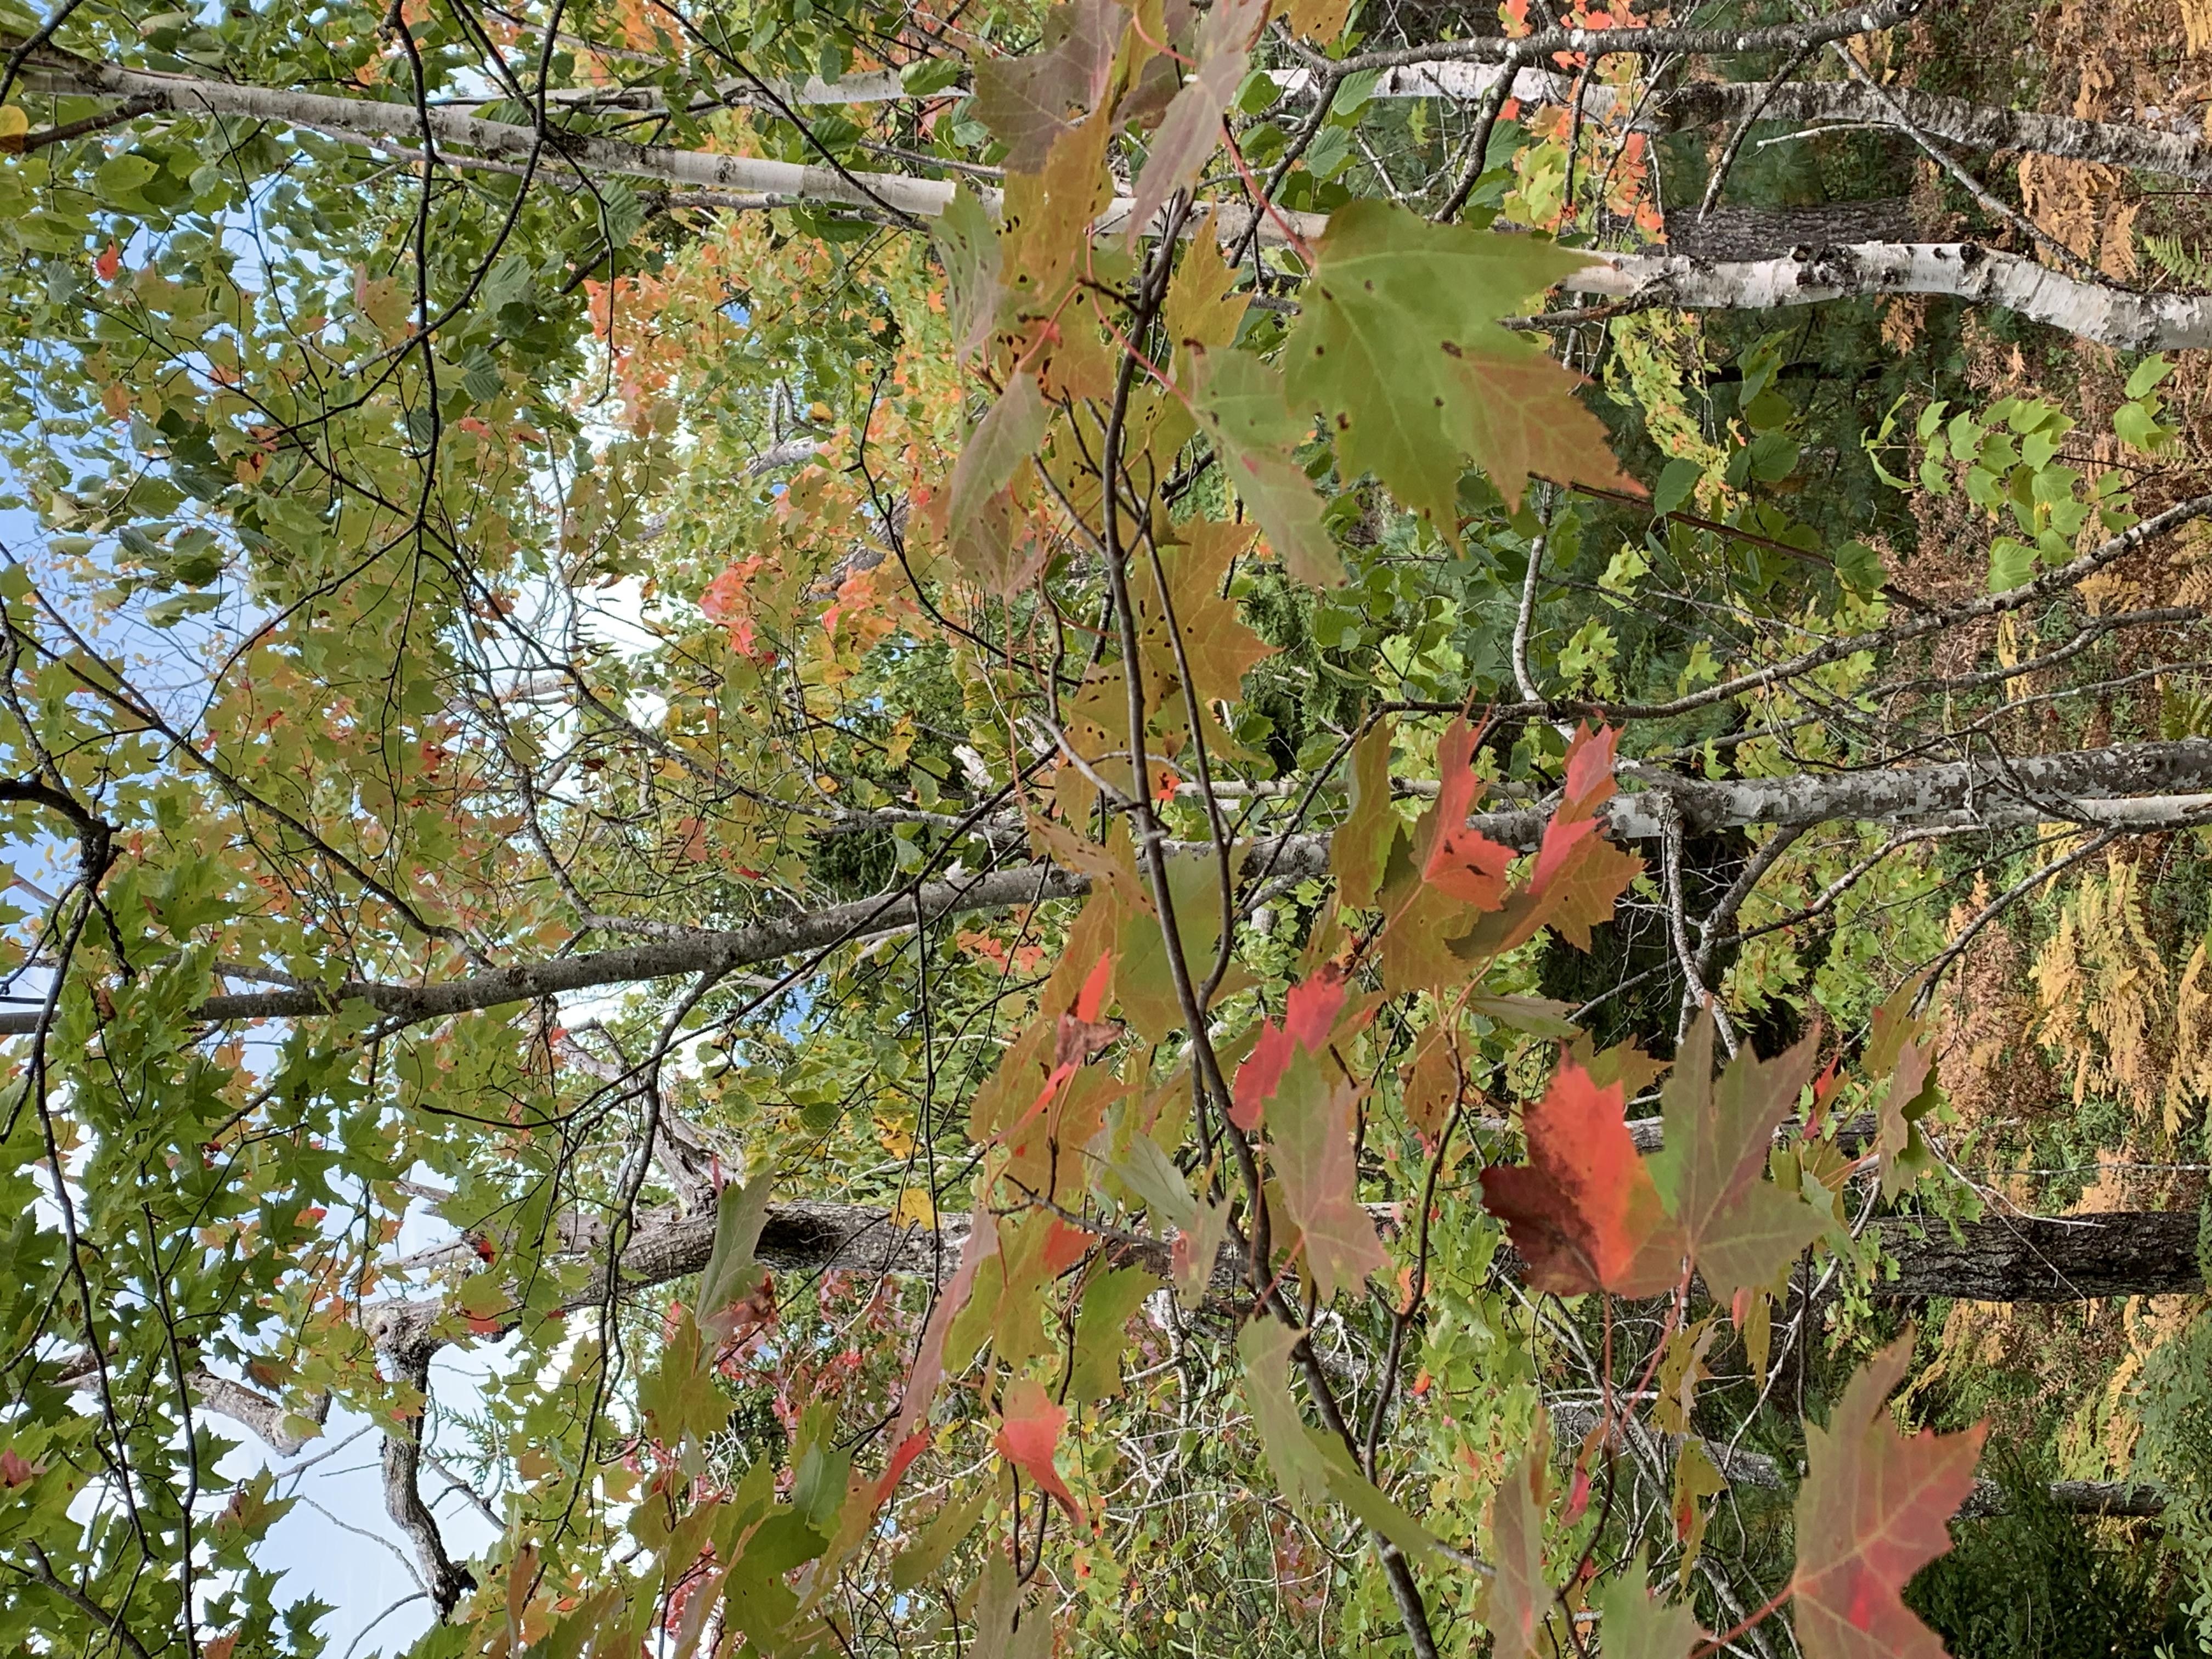 High Season for Leaf Peeping in Acadia is Mid-October